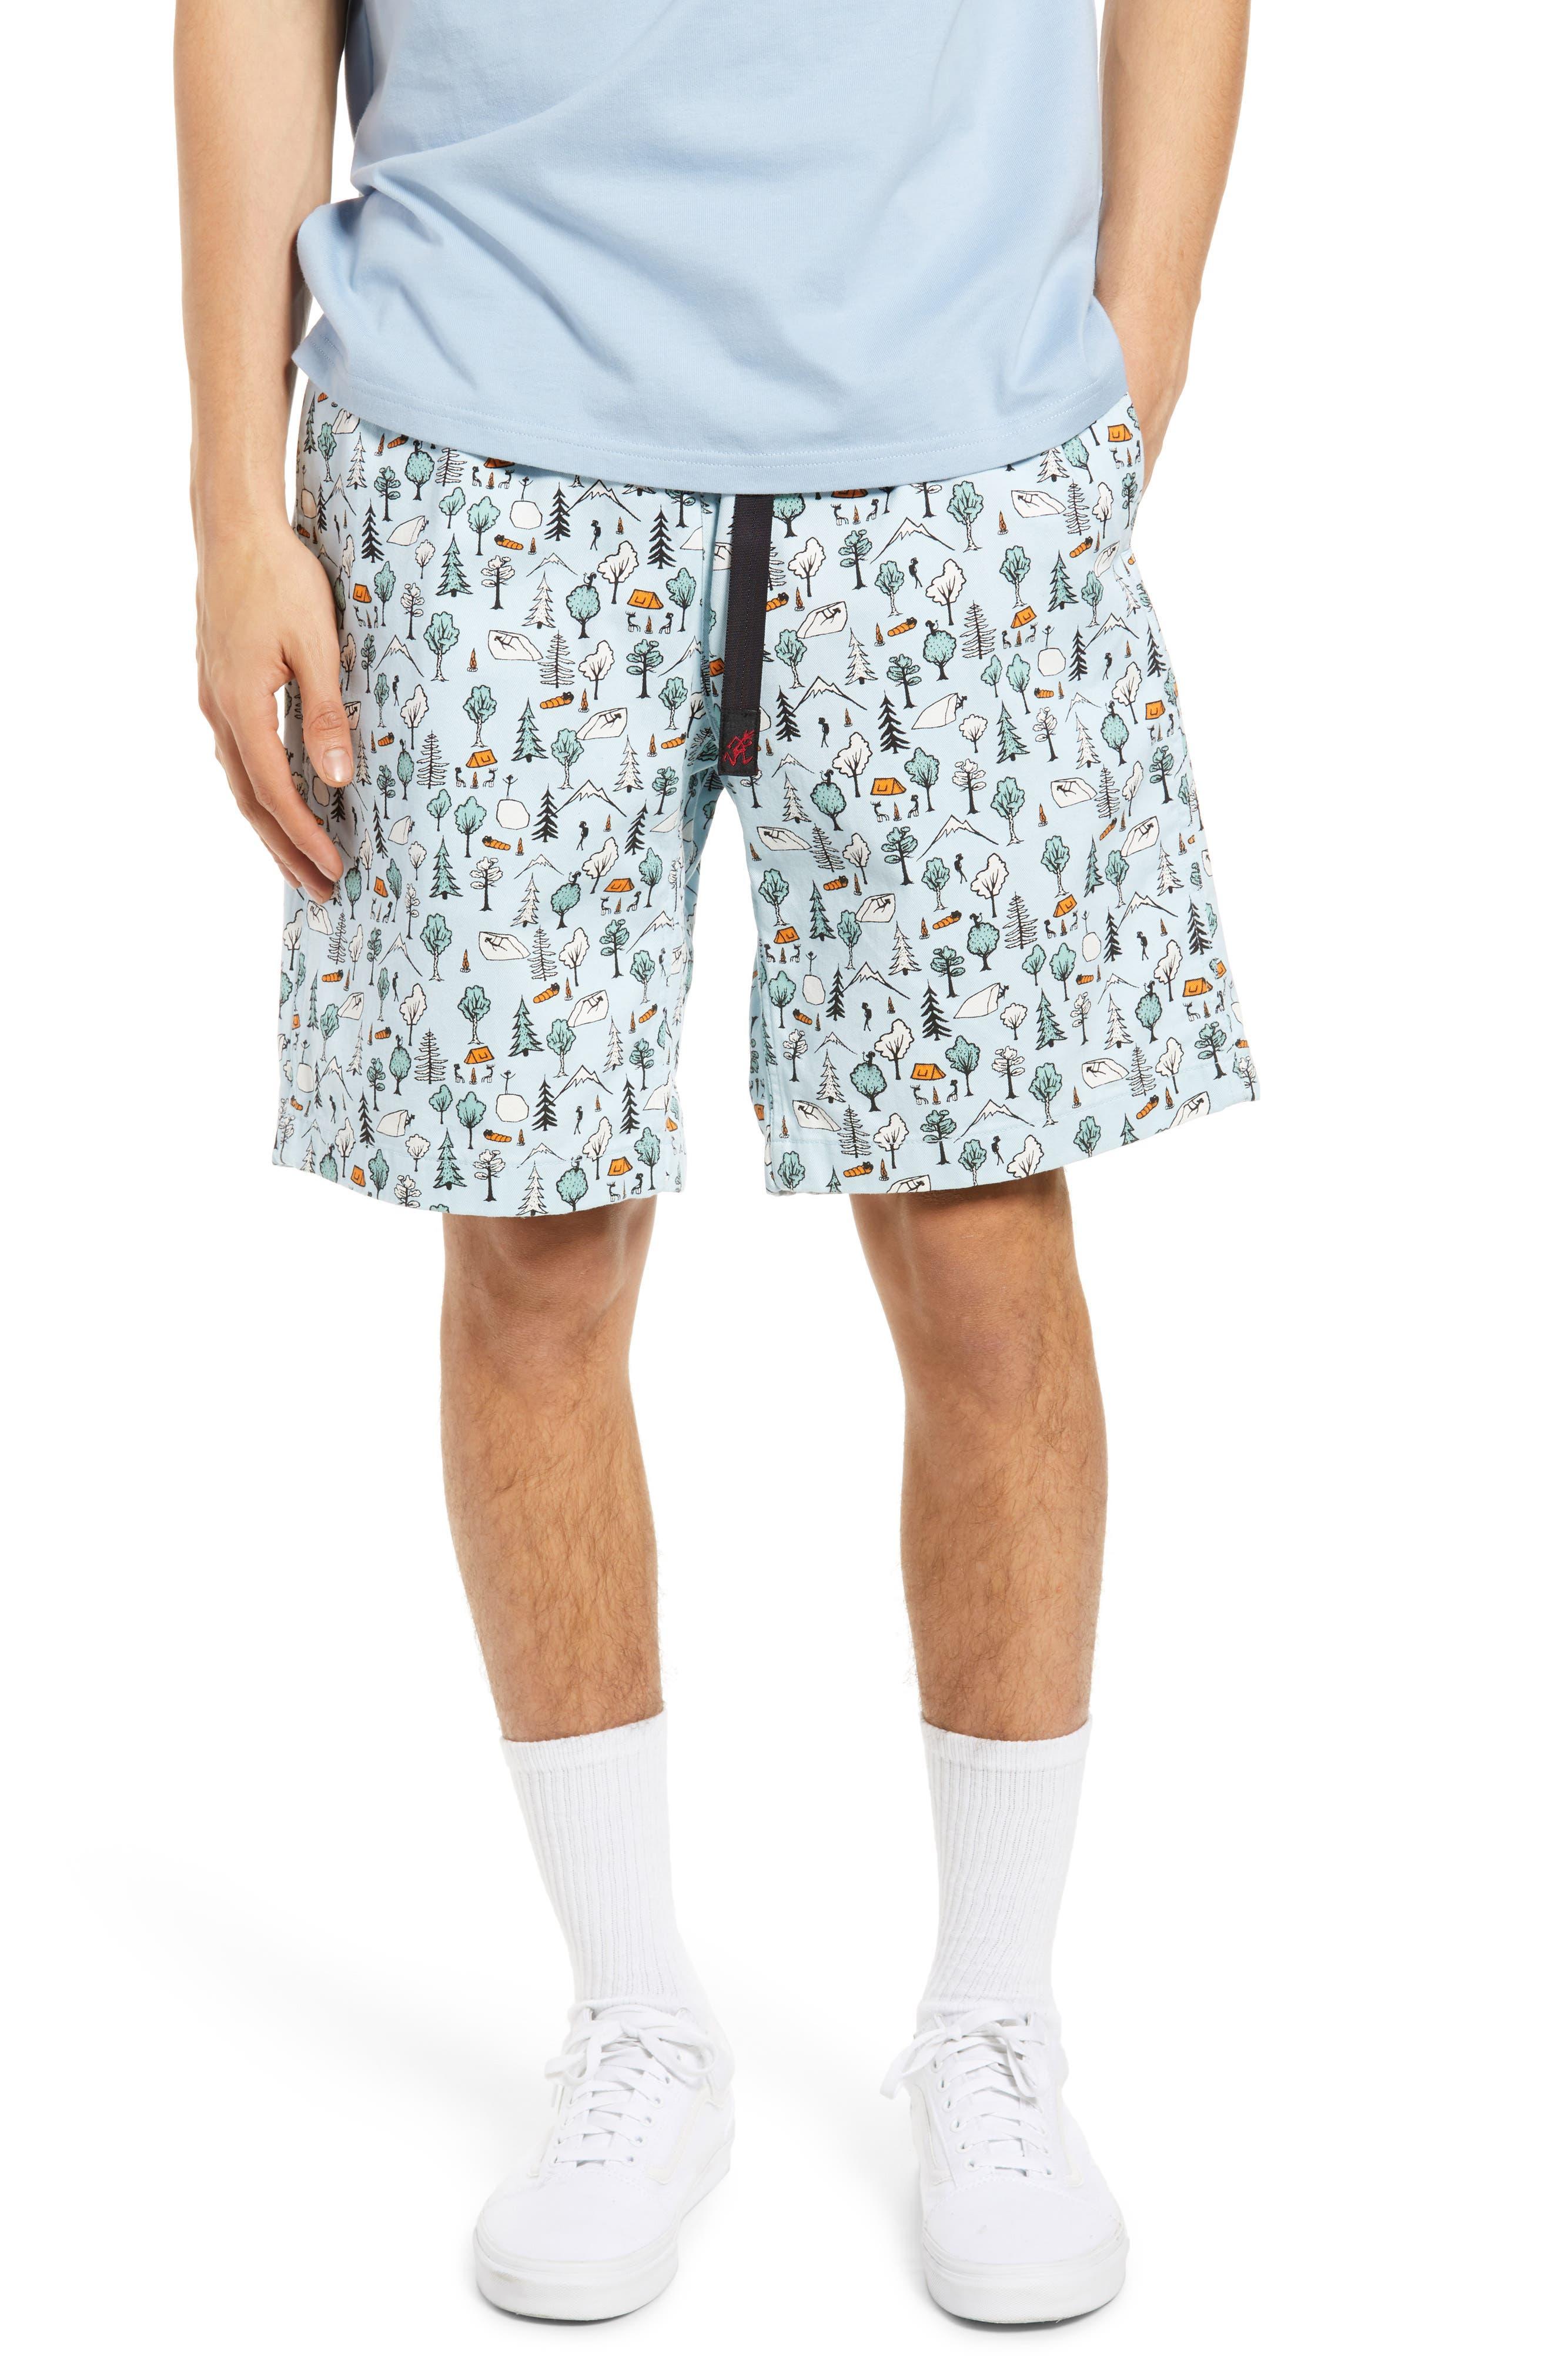 Jonas Claesson Cotton Shorts